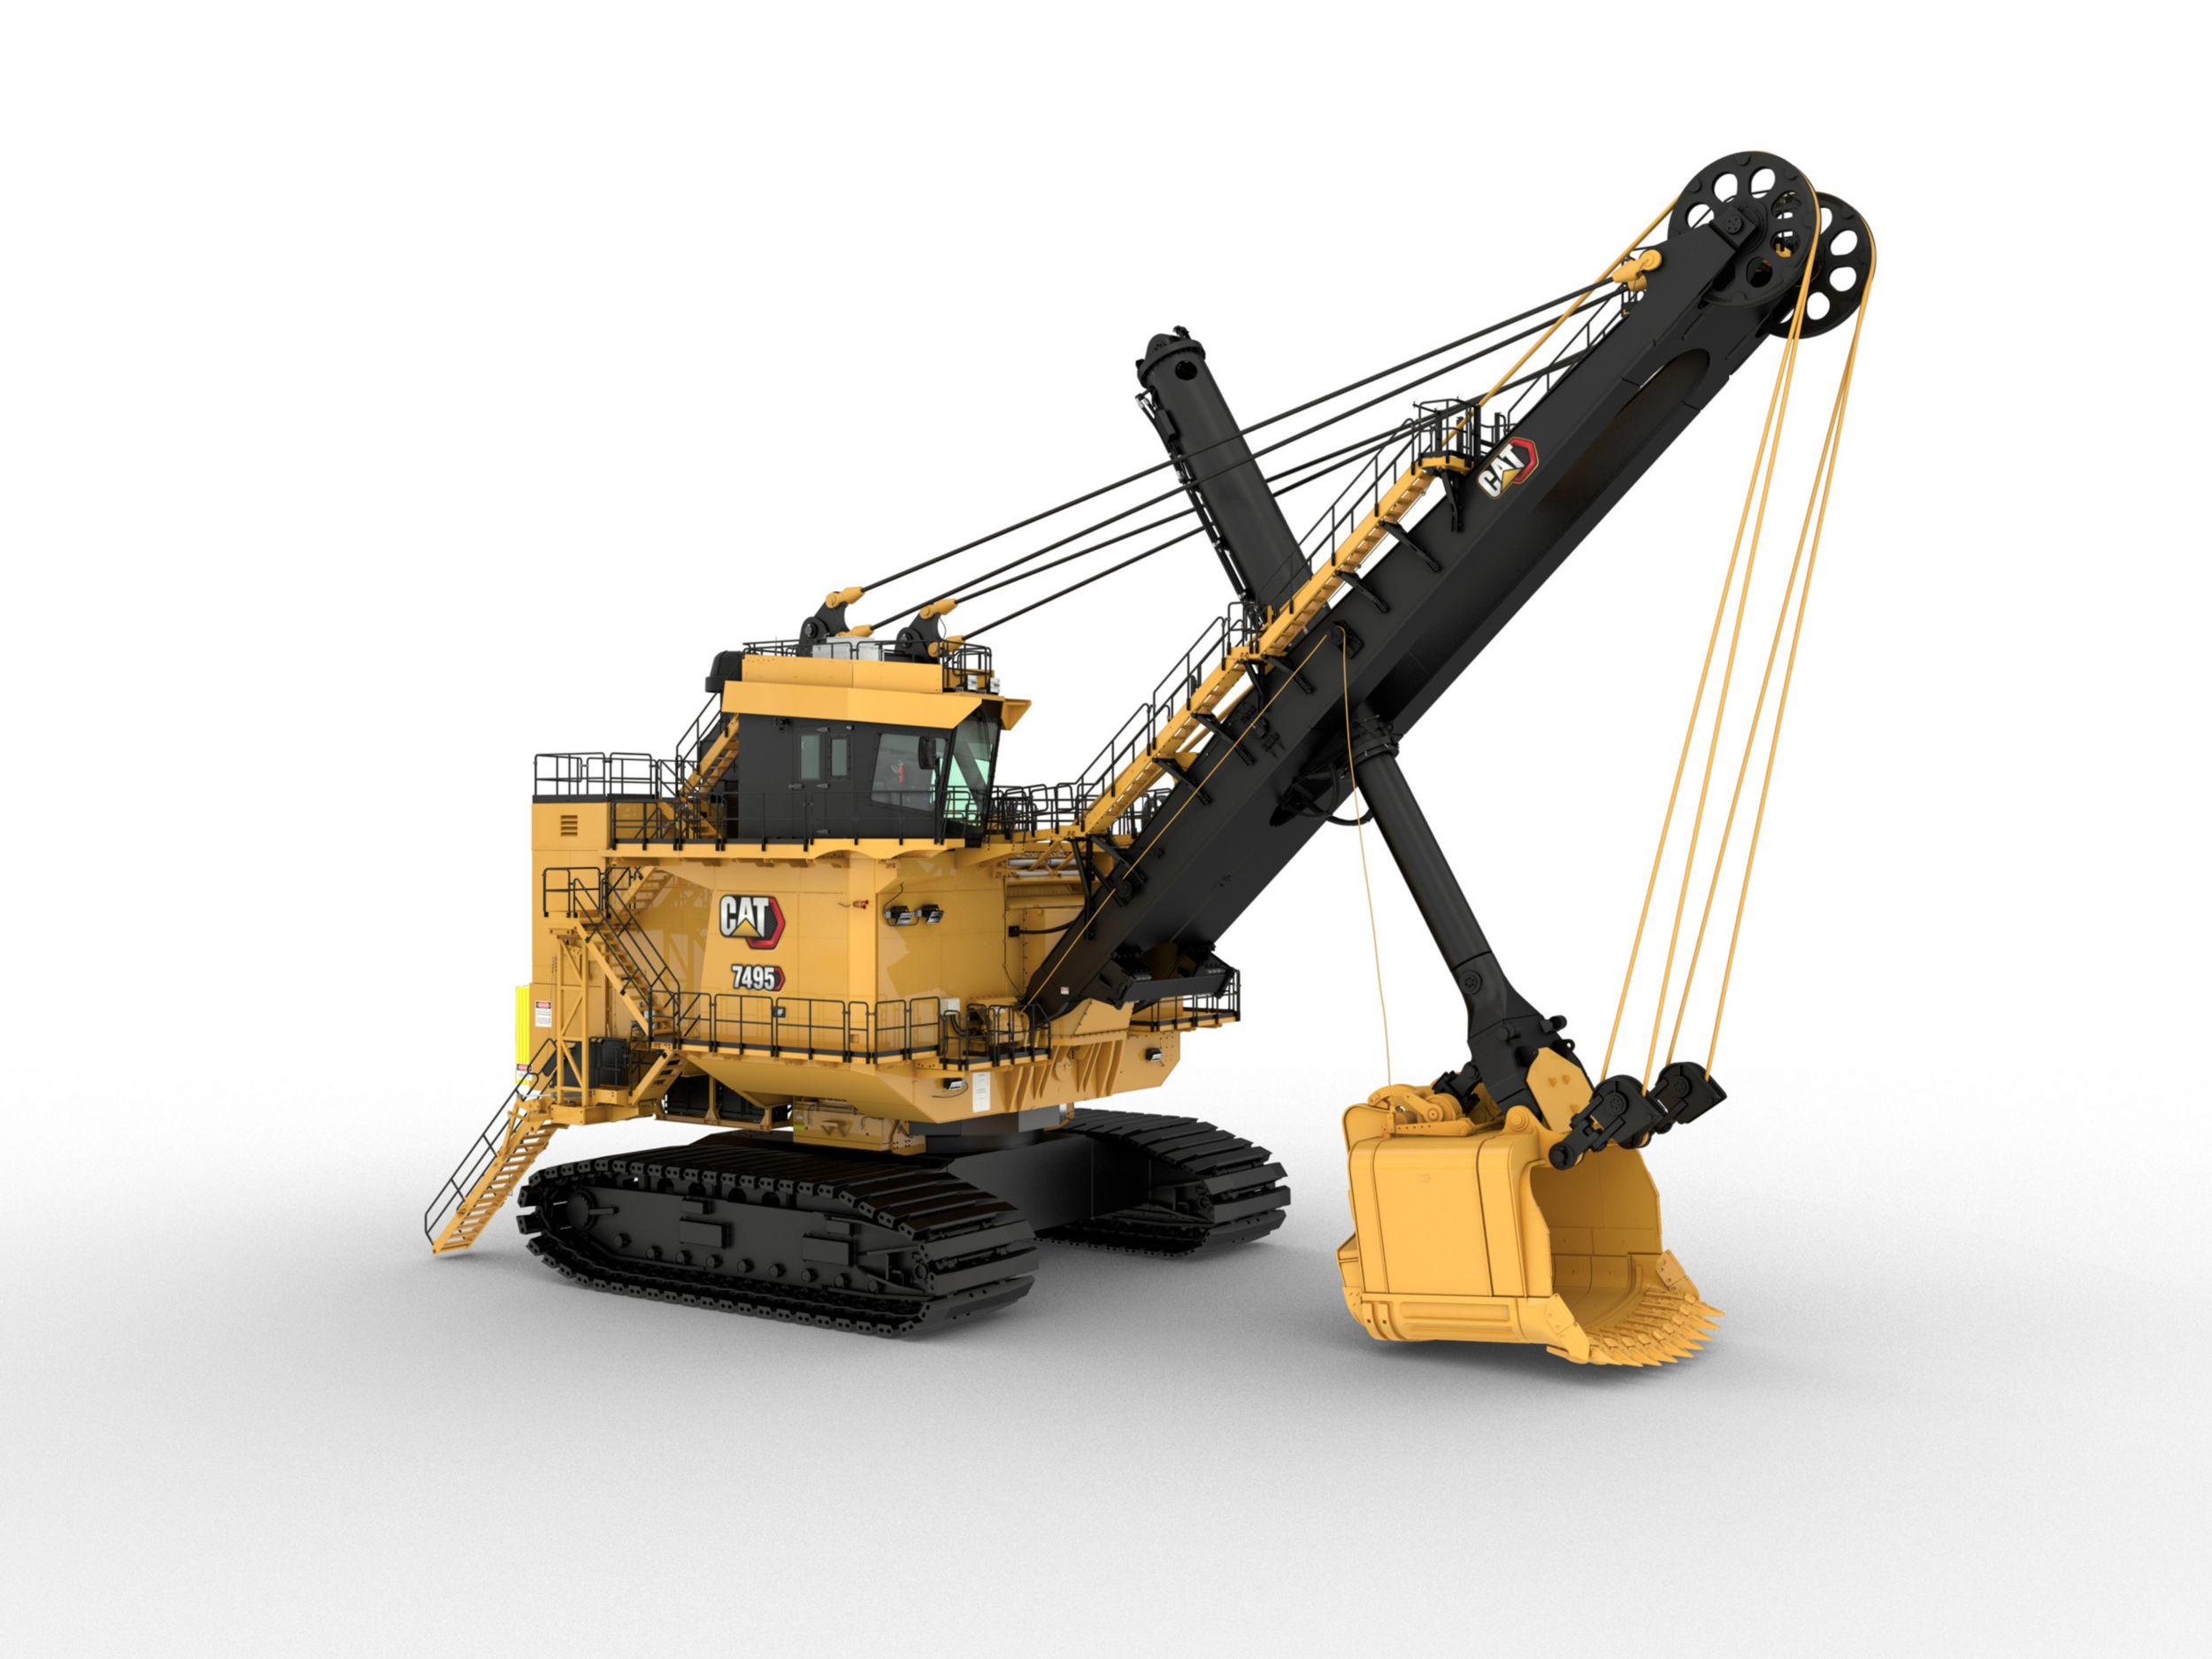 Cat 7495 Electric Rope Shovel